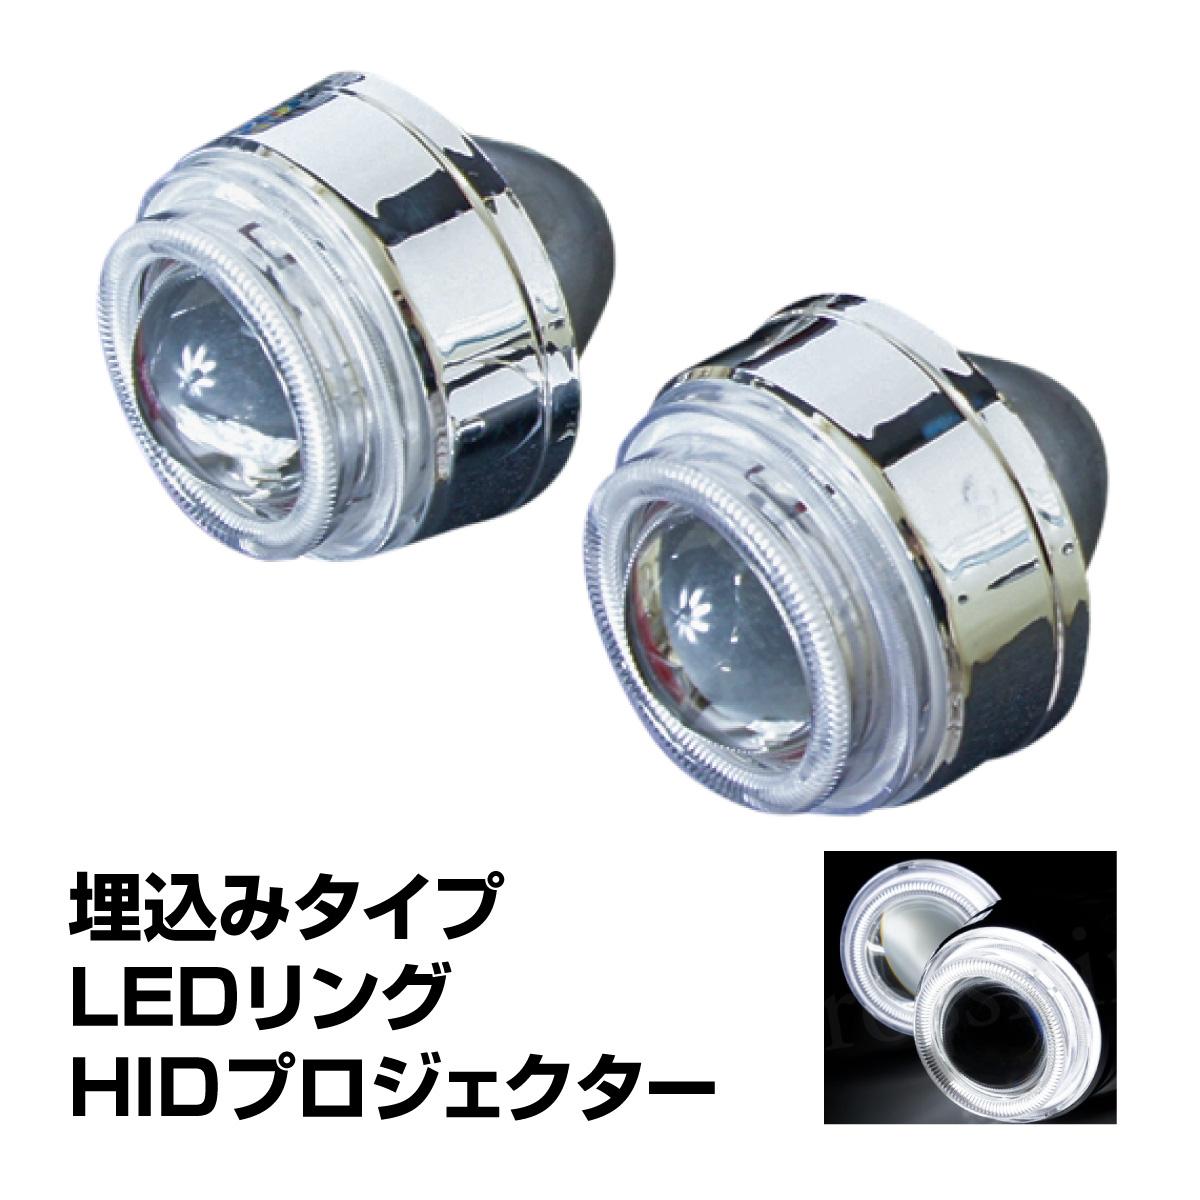 HID プロジェクター ヘッドライト ライト カスタム 用 外 105mm 白 ホワイト ダブル イカリング CCFL 白 ホワイトアイ LED バイキセノン Hi Low 切り替え 機能付 H1 6000K 35W _92054